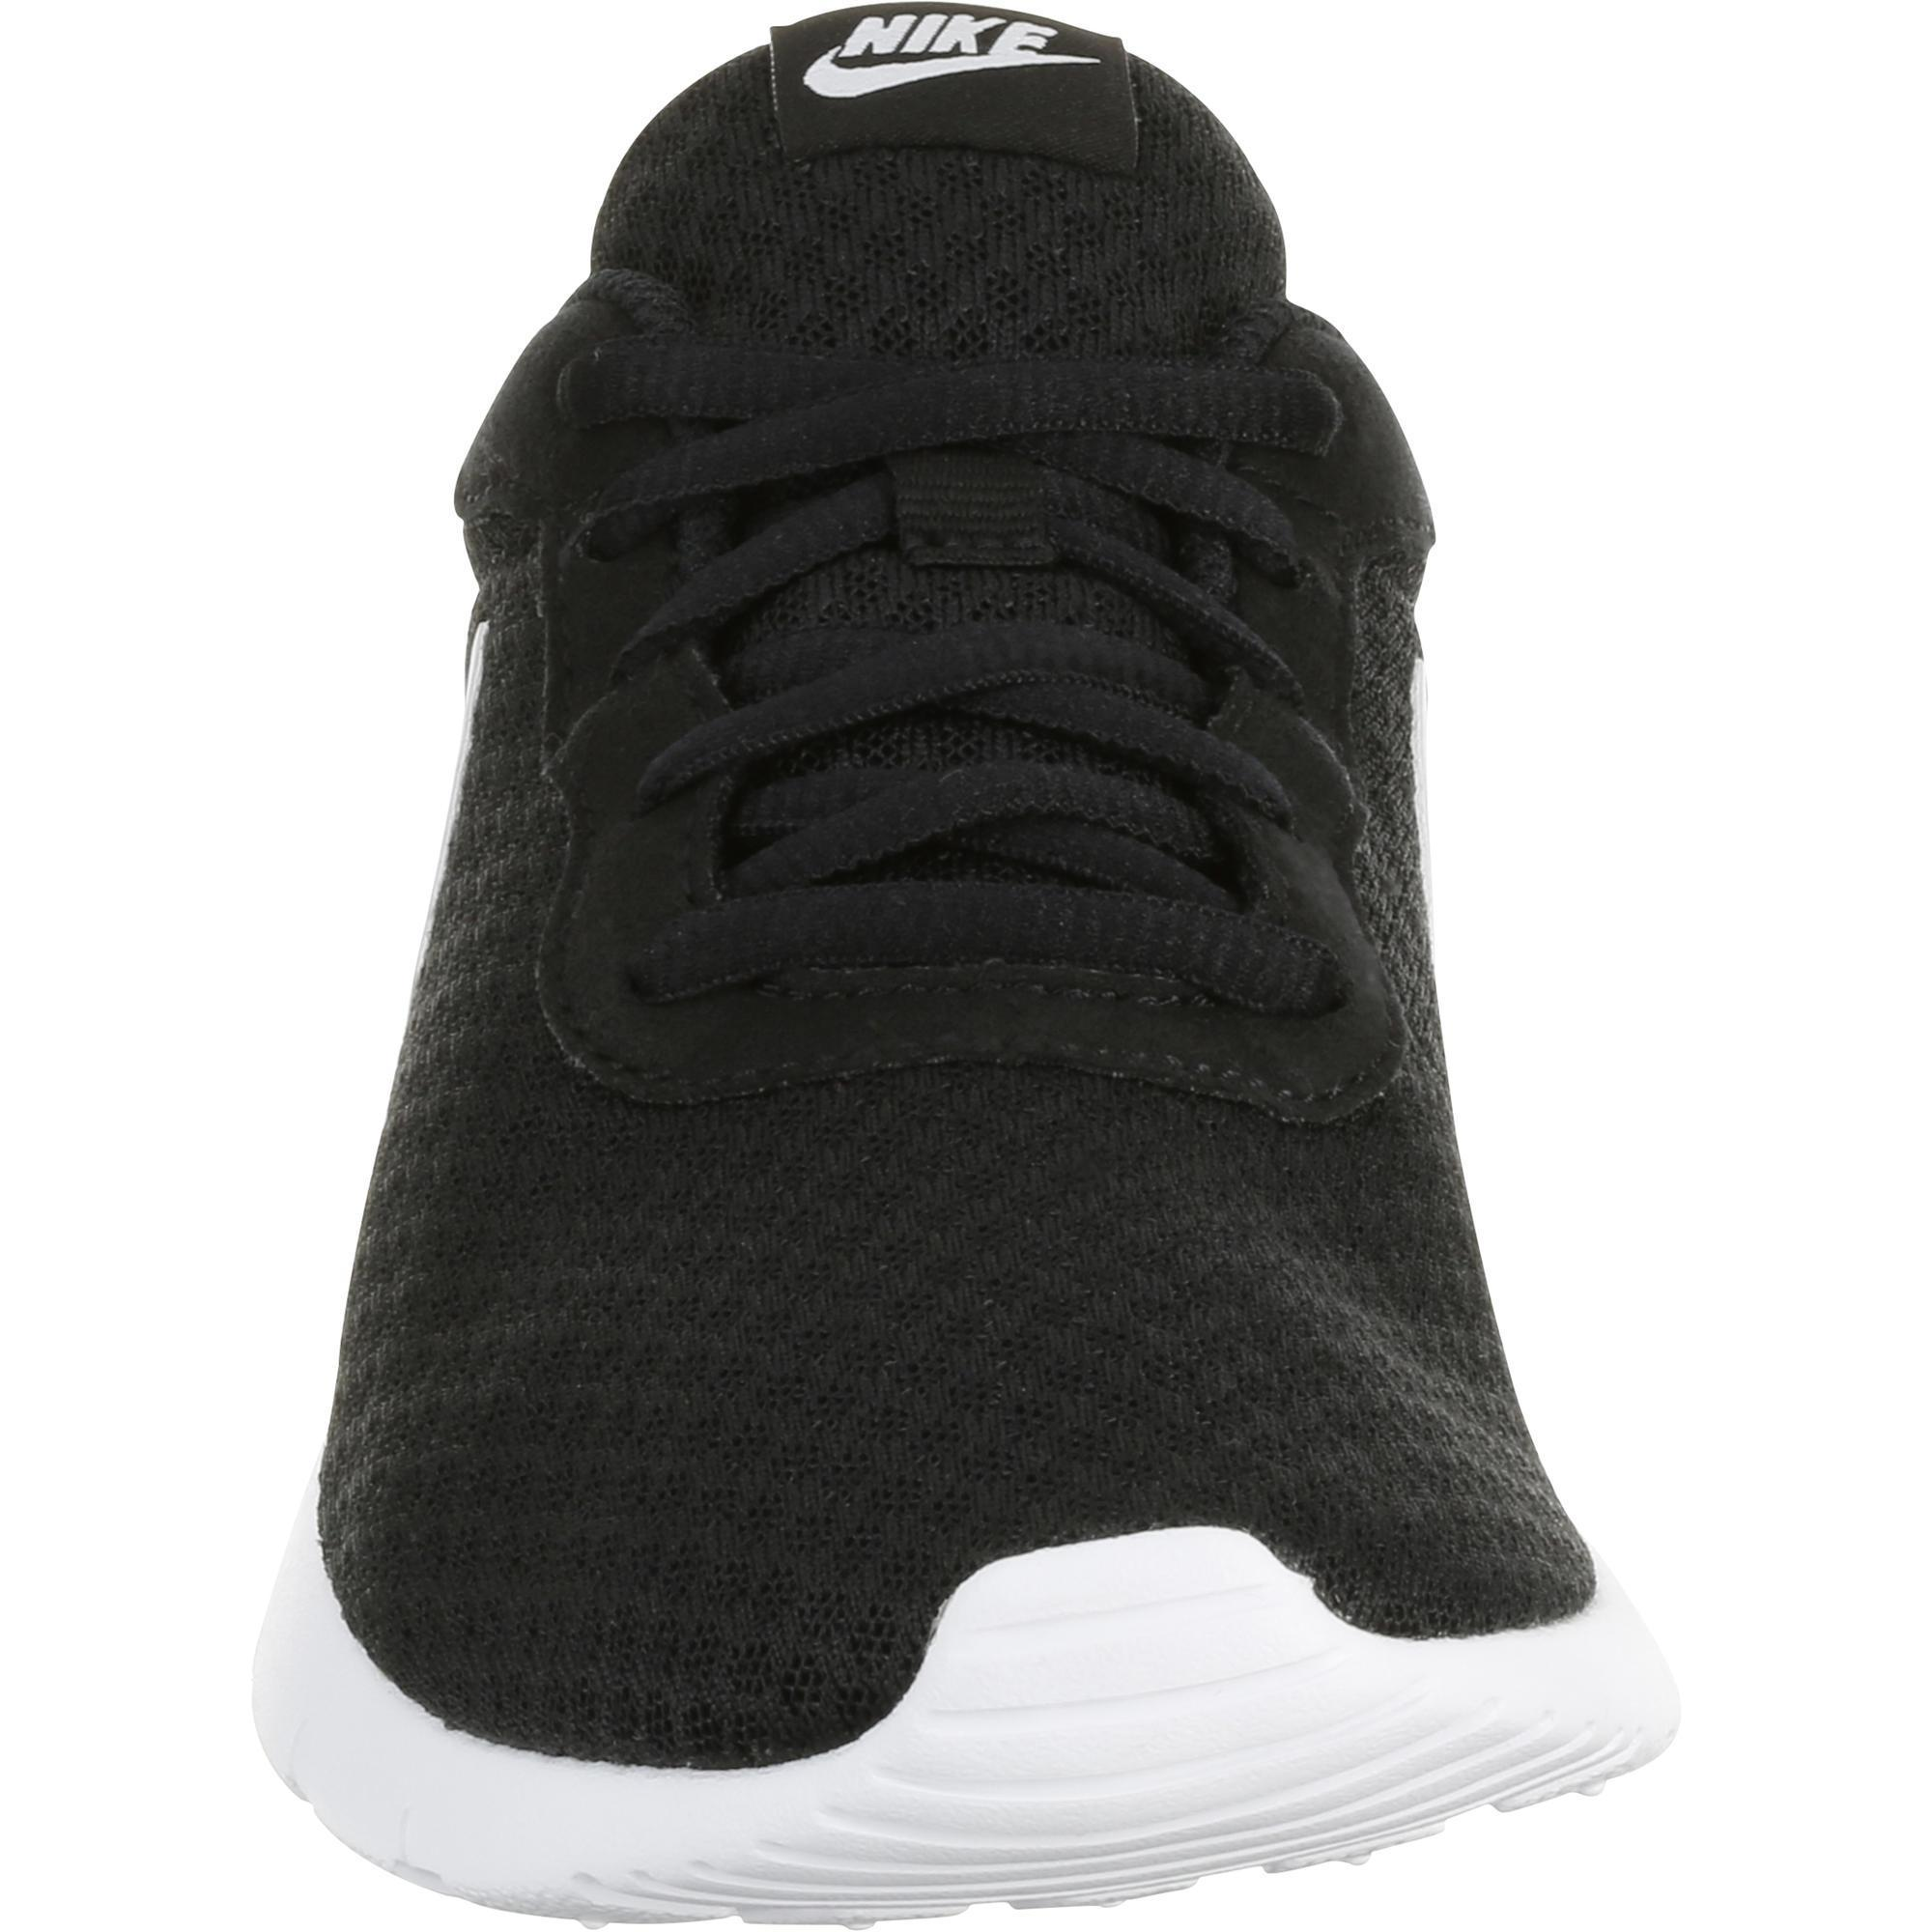 438570cbba Sportive Marche Noir Chaussures Tanjun Decathlon Blanc Enfant Nike BwPHqfB